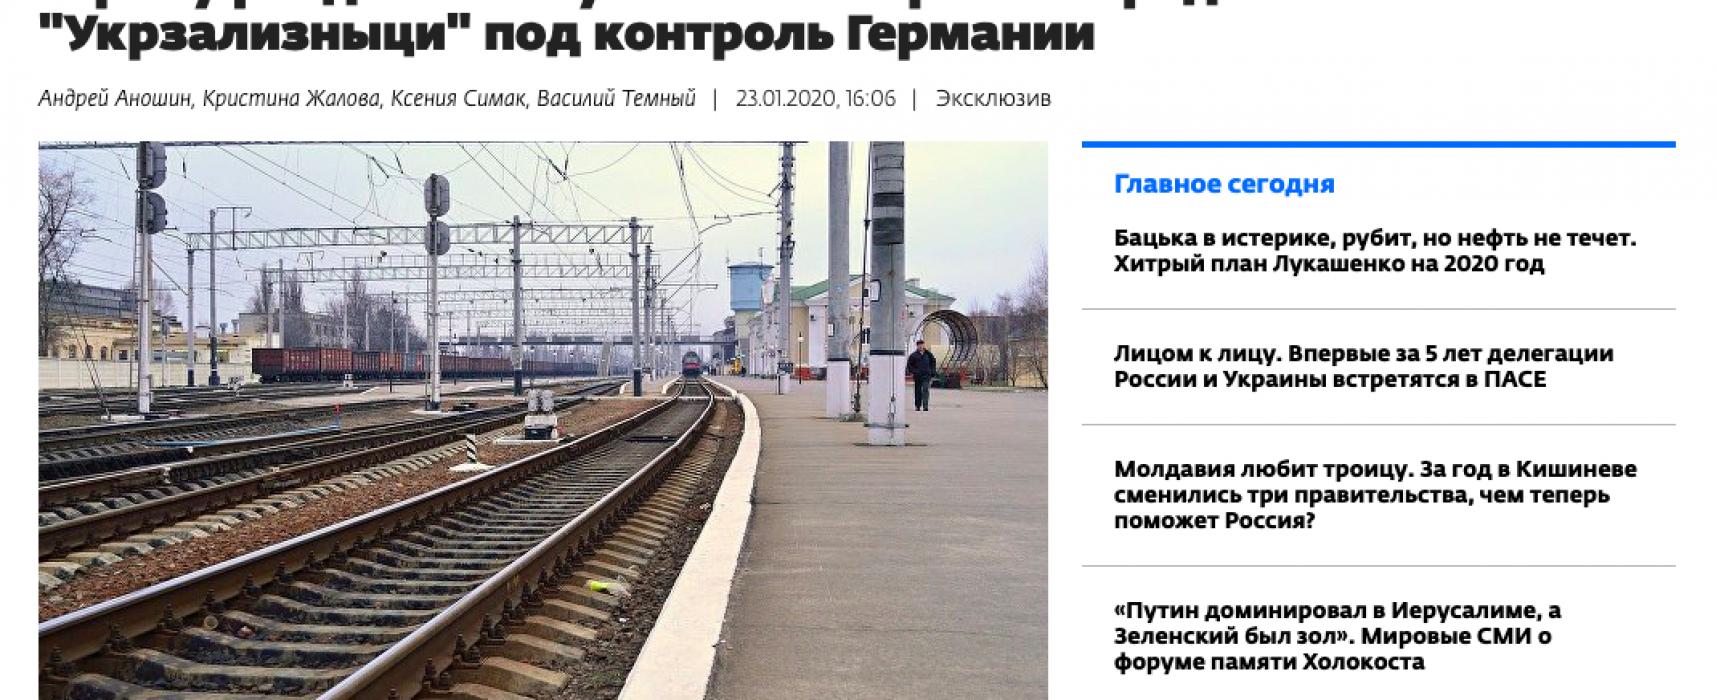 Falso: Deutsche Bahn se convierte en el dueño del ferrocarril ucraniano Ukrzaliznytsia